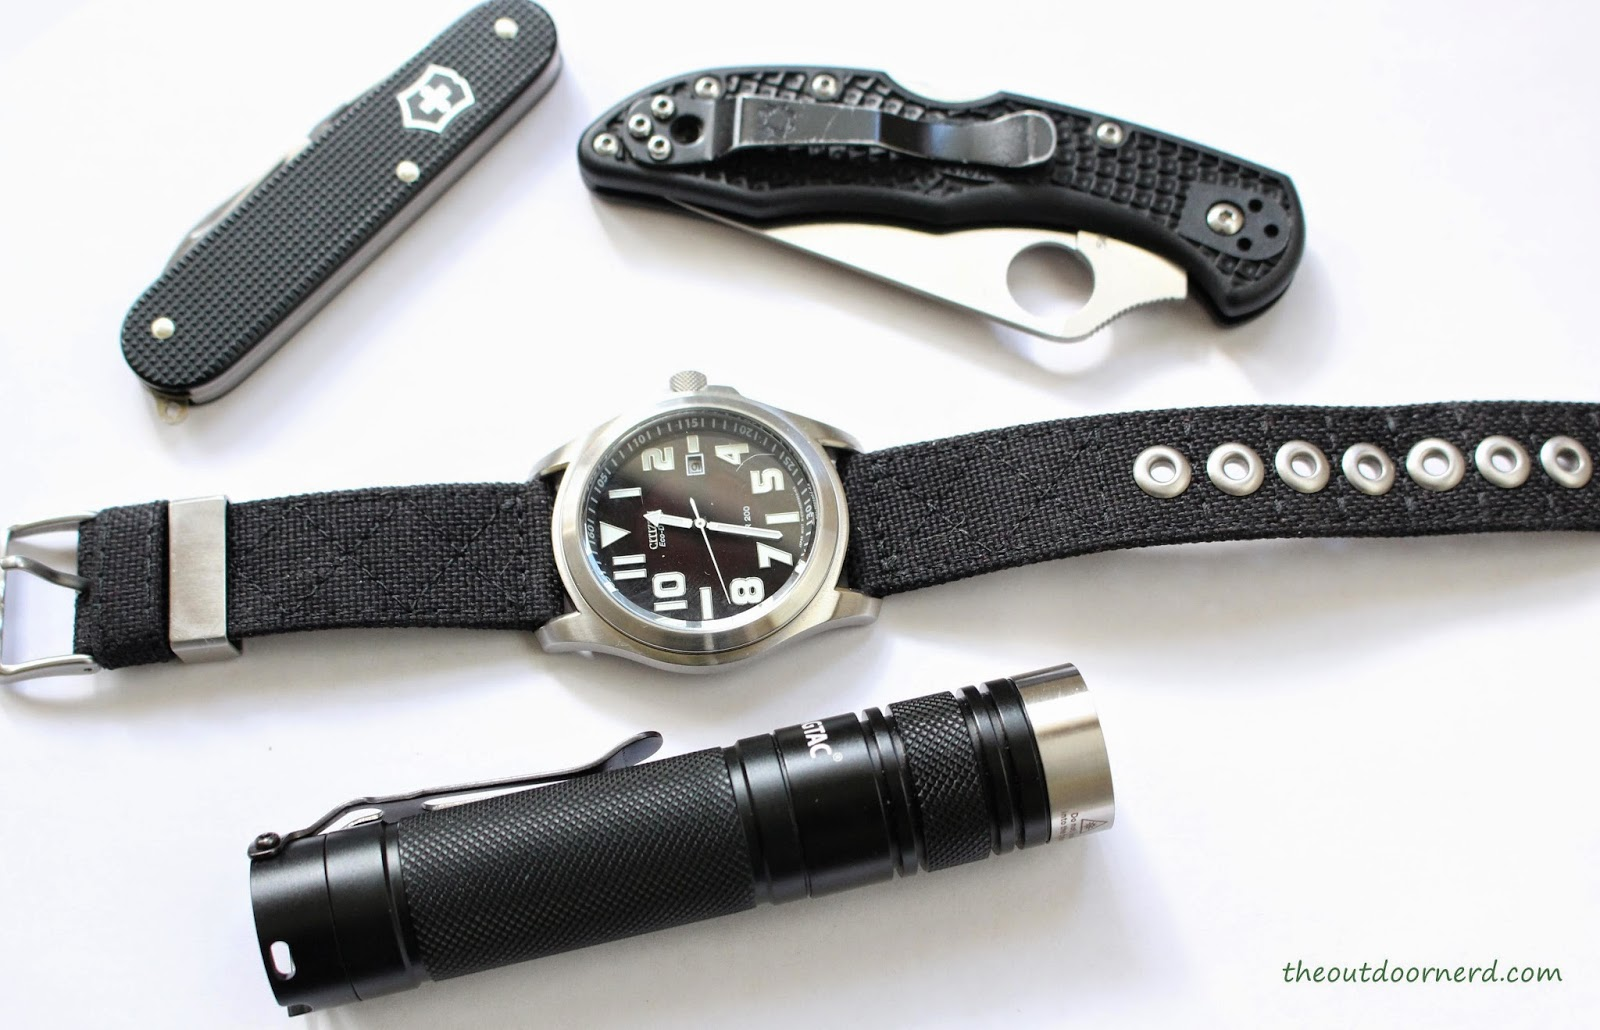 EagleTac D25LC2 Mini 18650 Flashlight With Friends 1